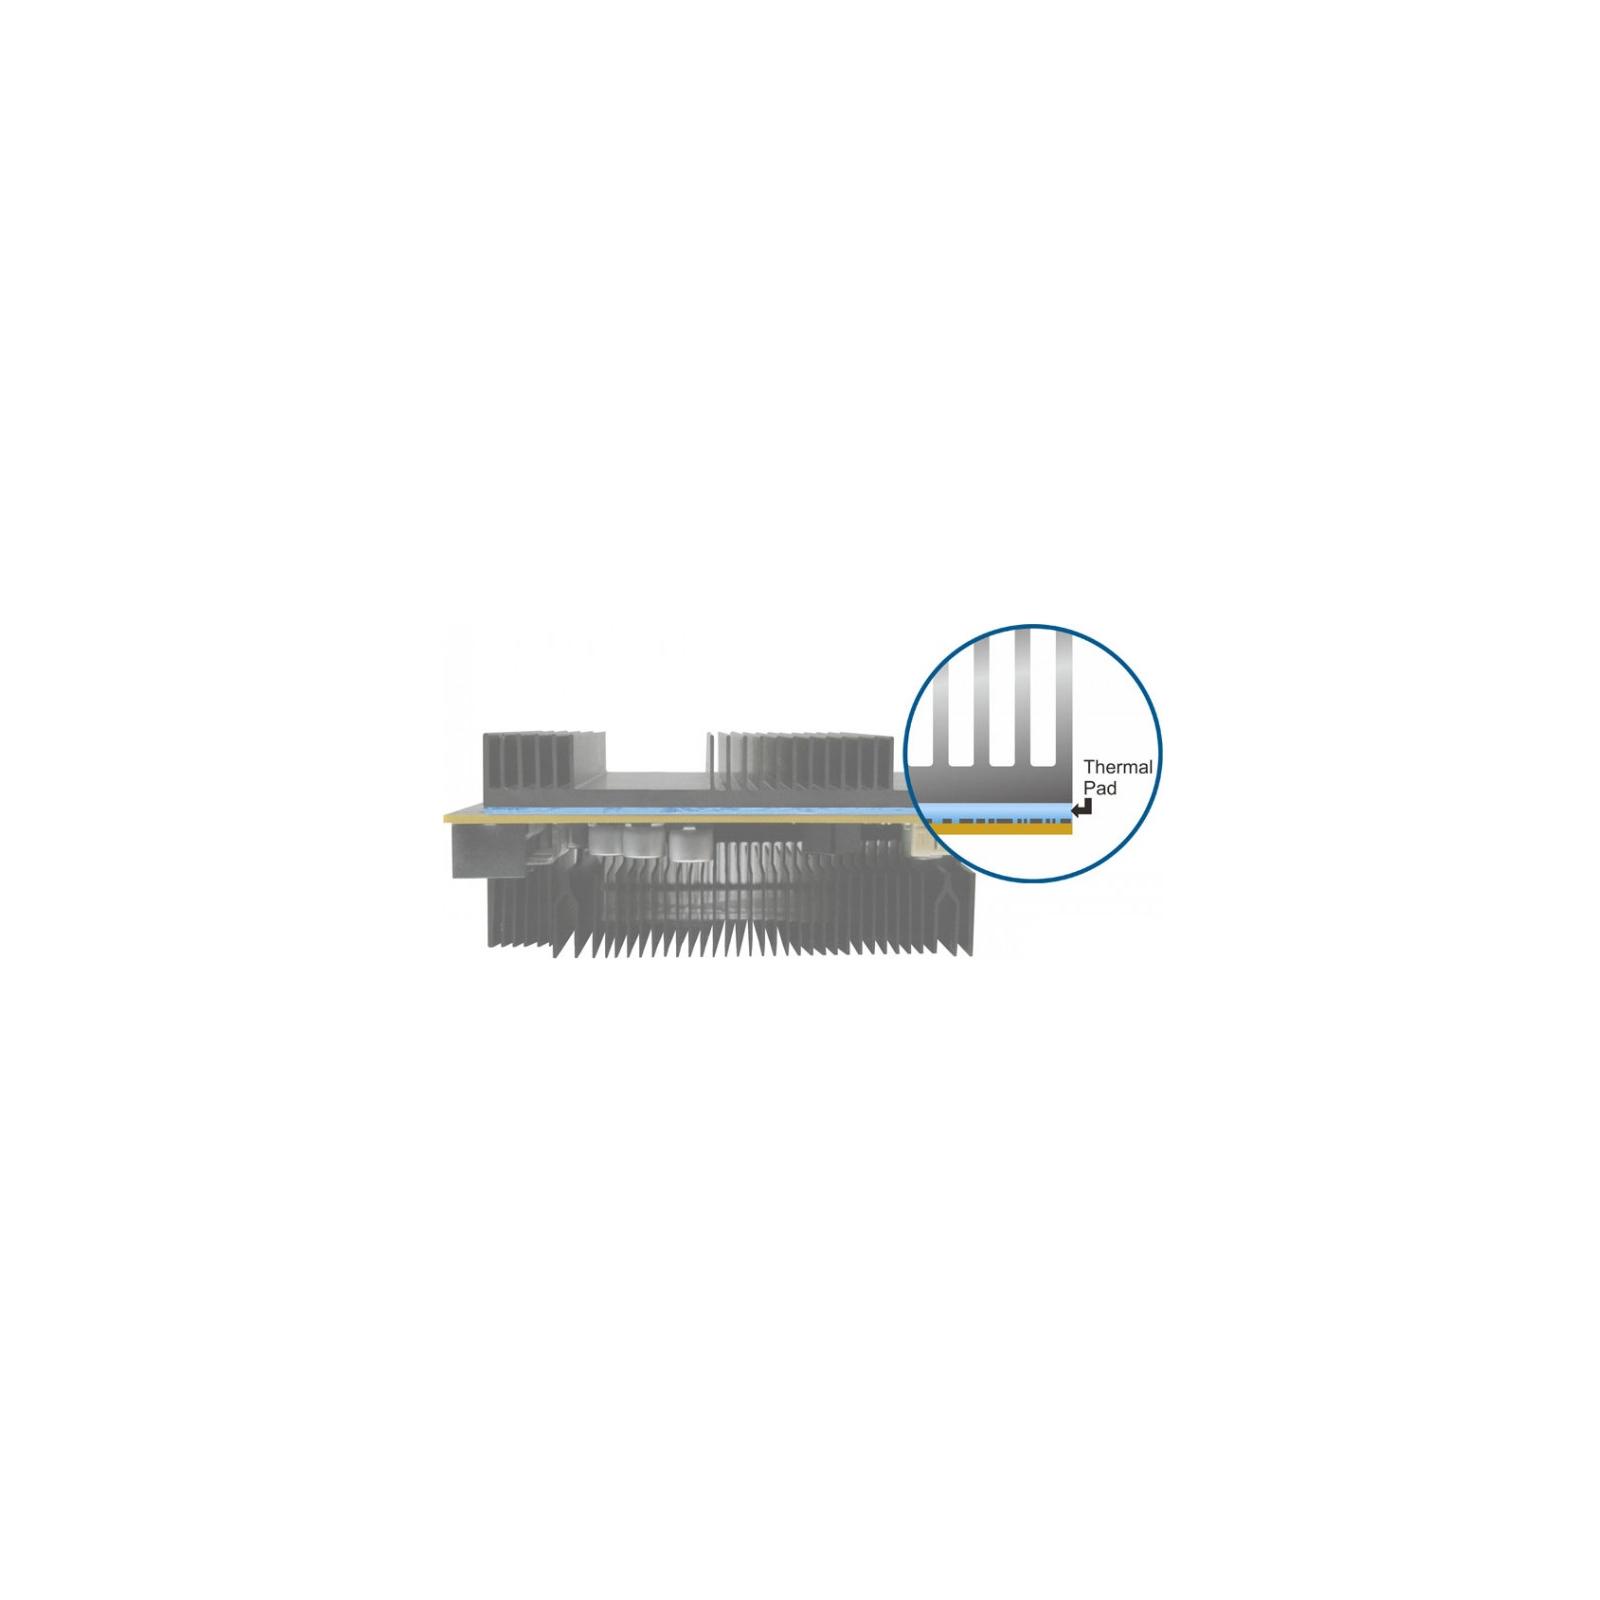 Термопрокладка Arctic Thermal pad 145x145mm t 1.0mm (ACTPD00005A) изображение 5